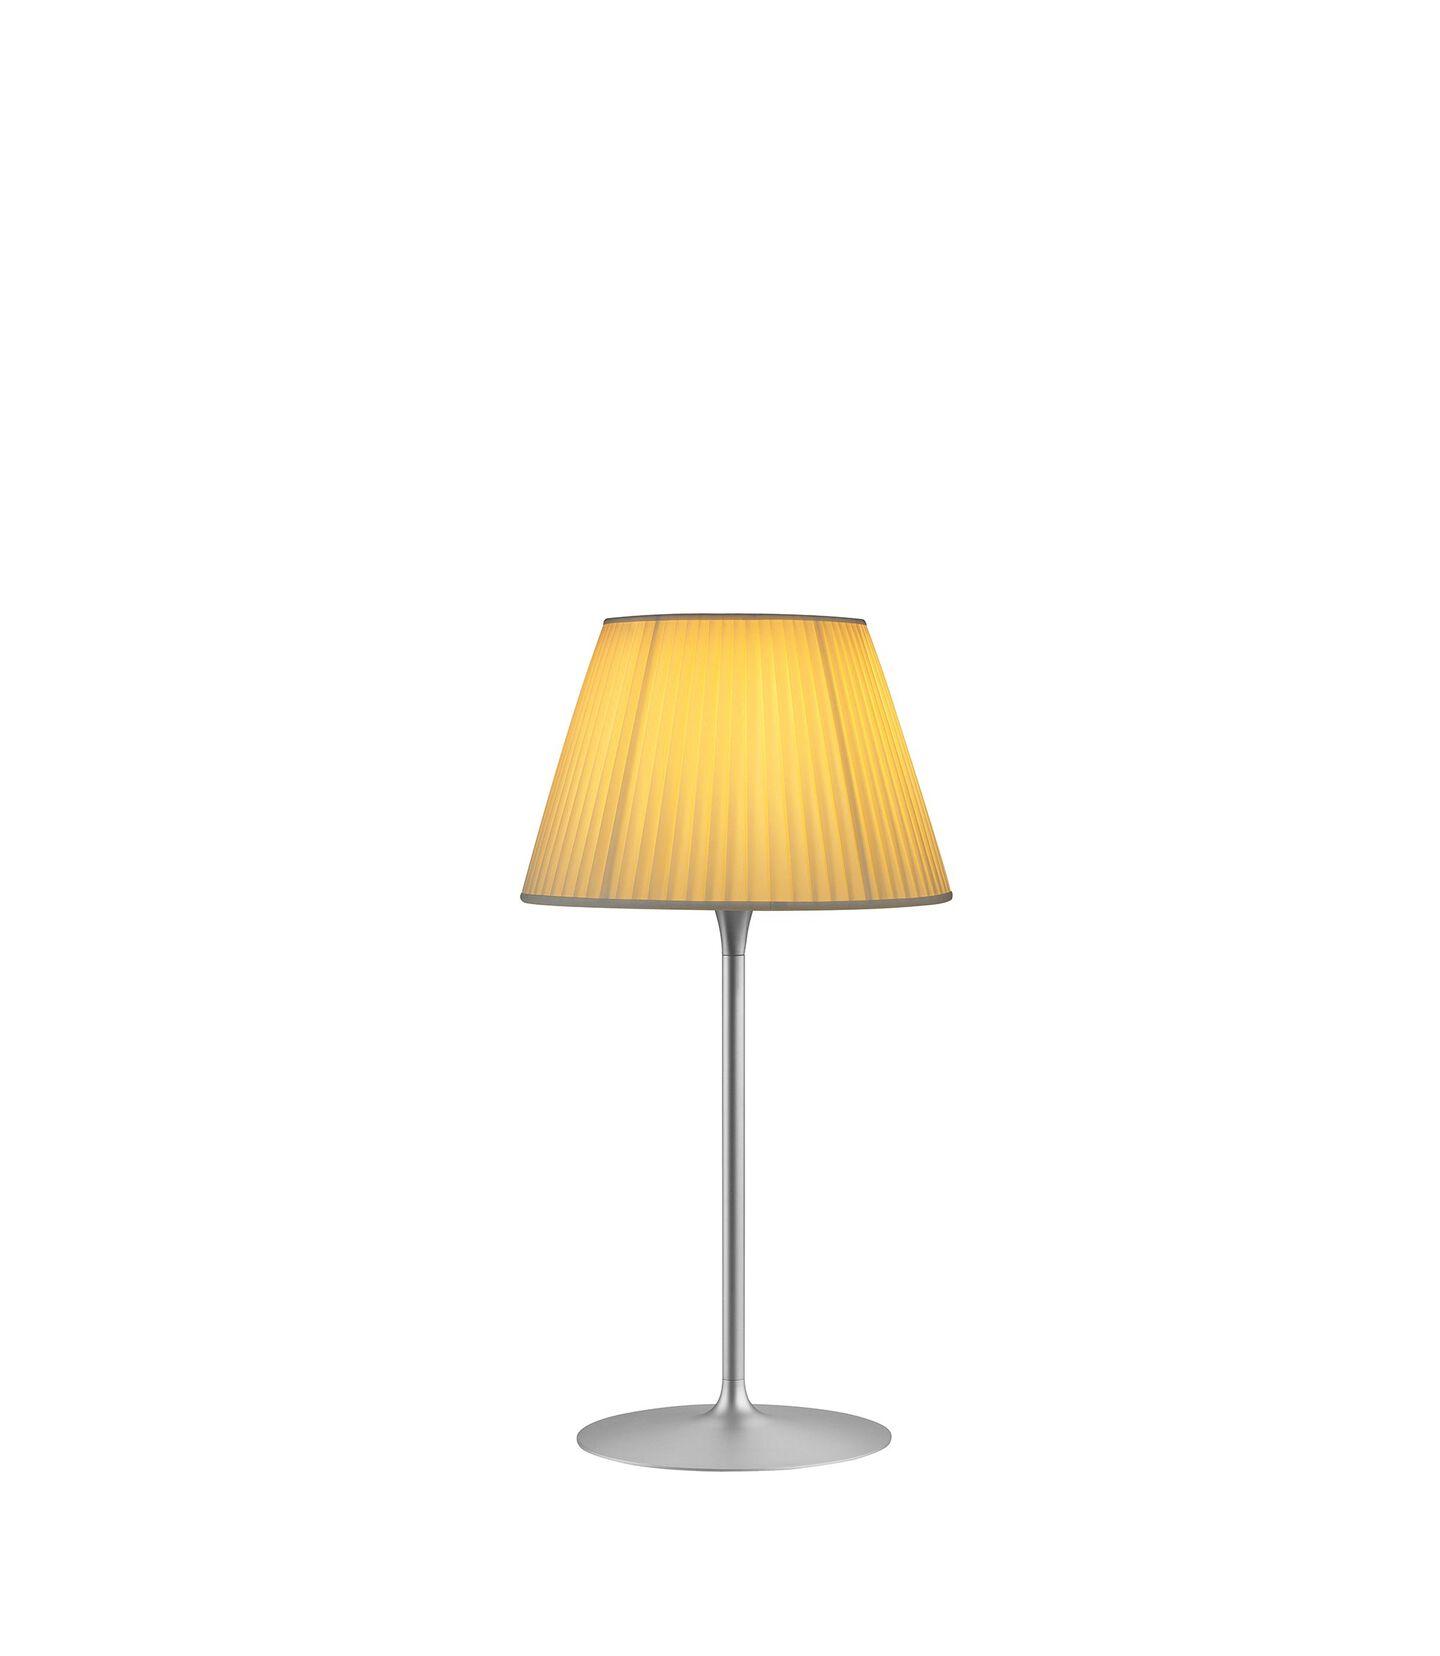 romeo-soft-table-starck-flos-F6107007-product-still-life-big